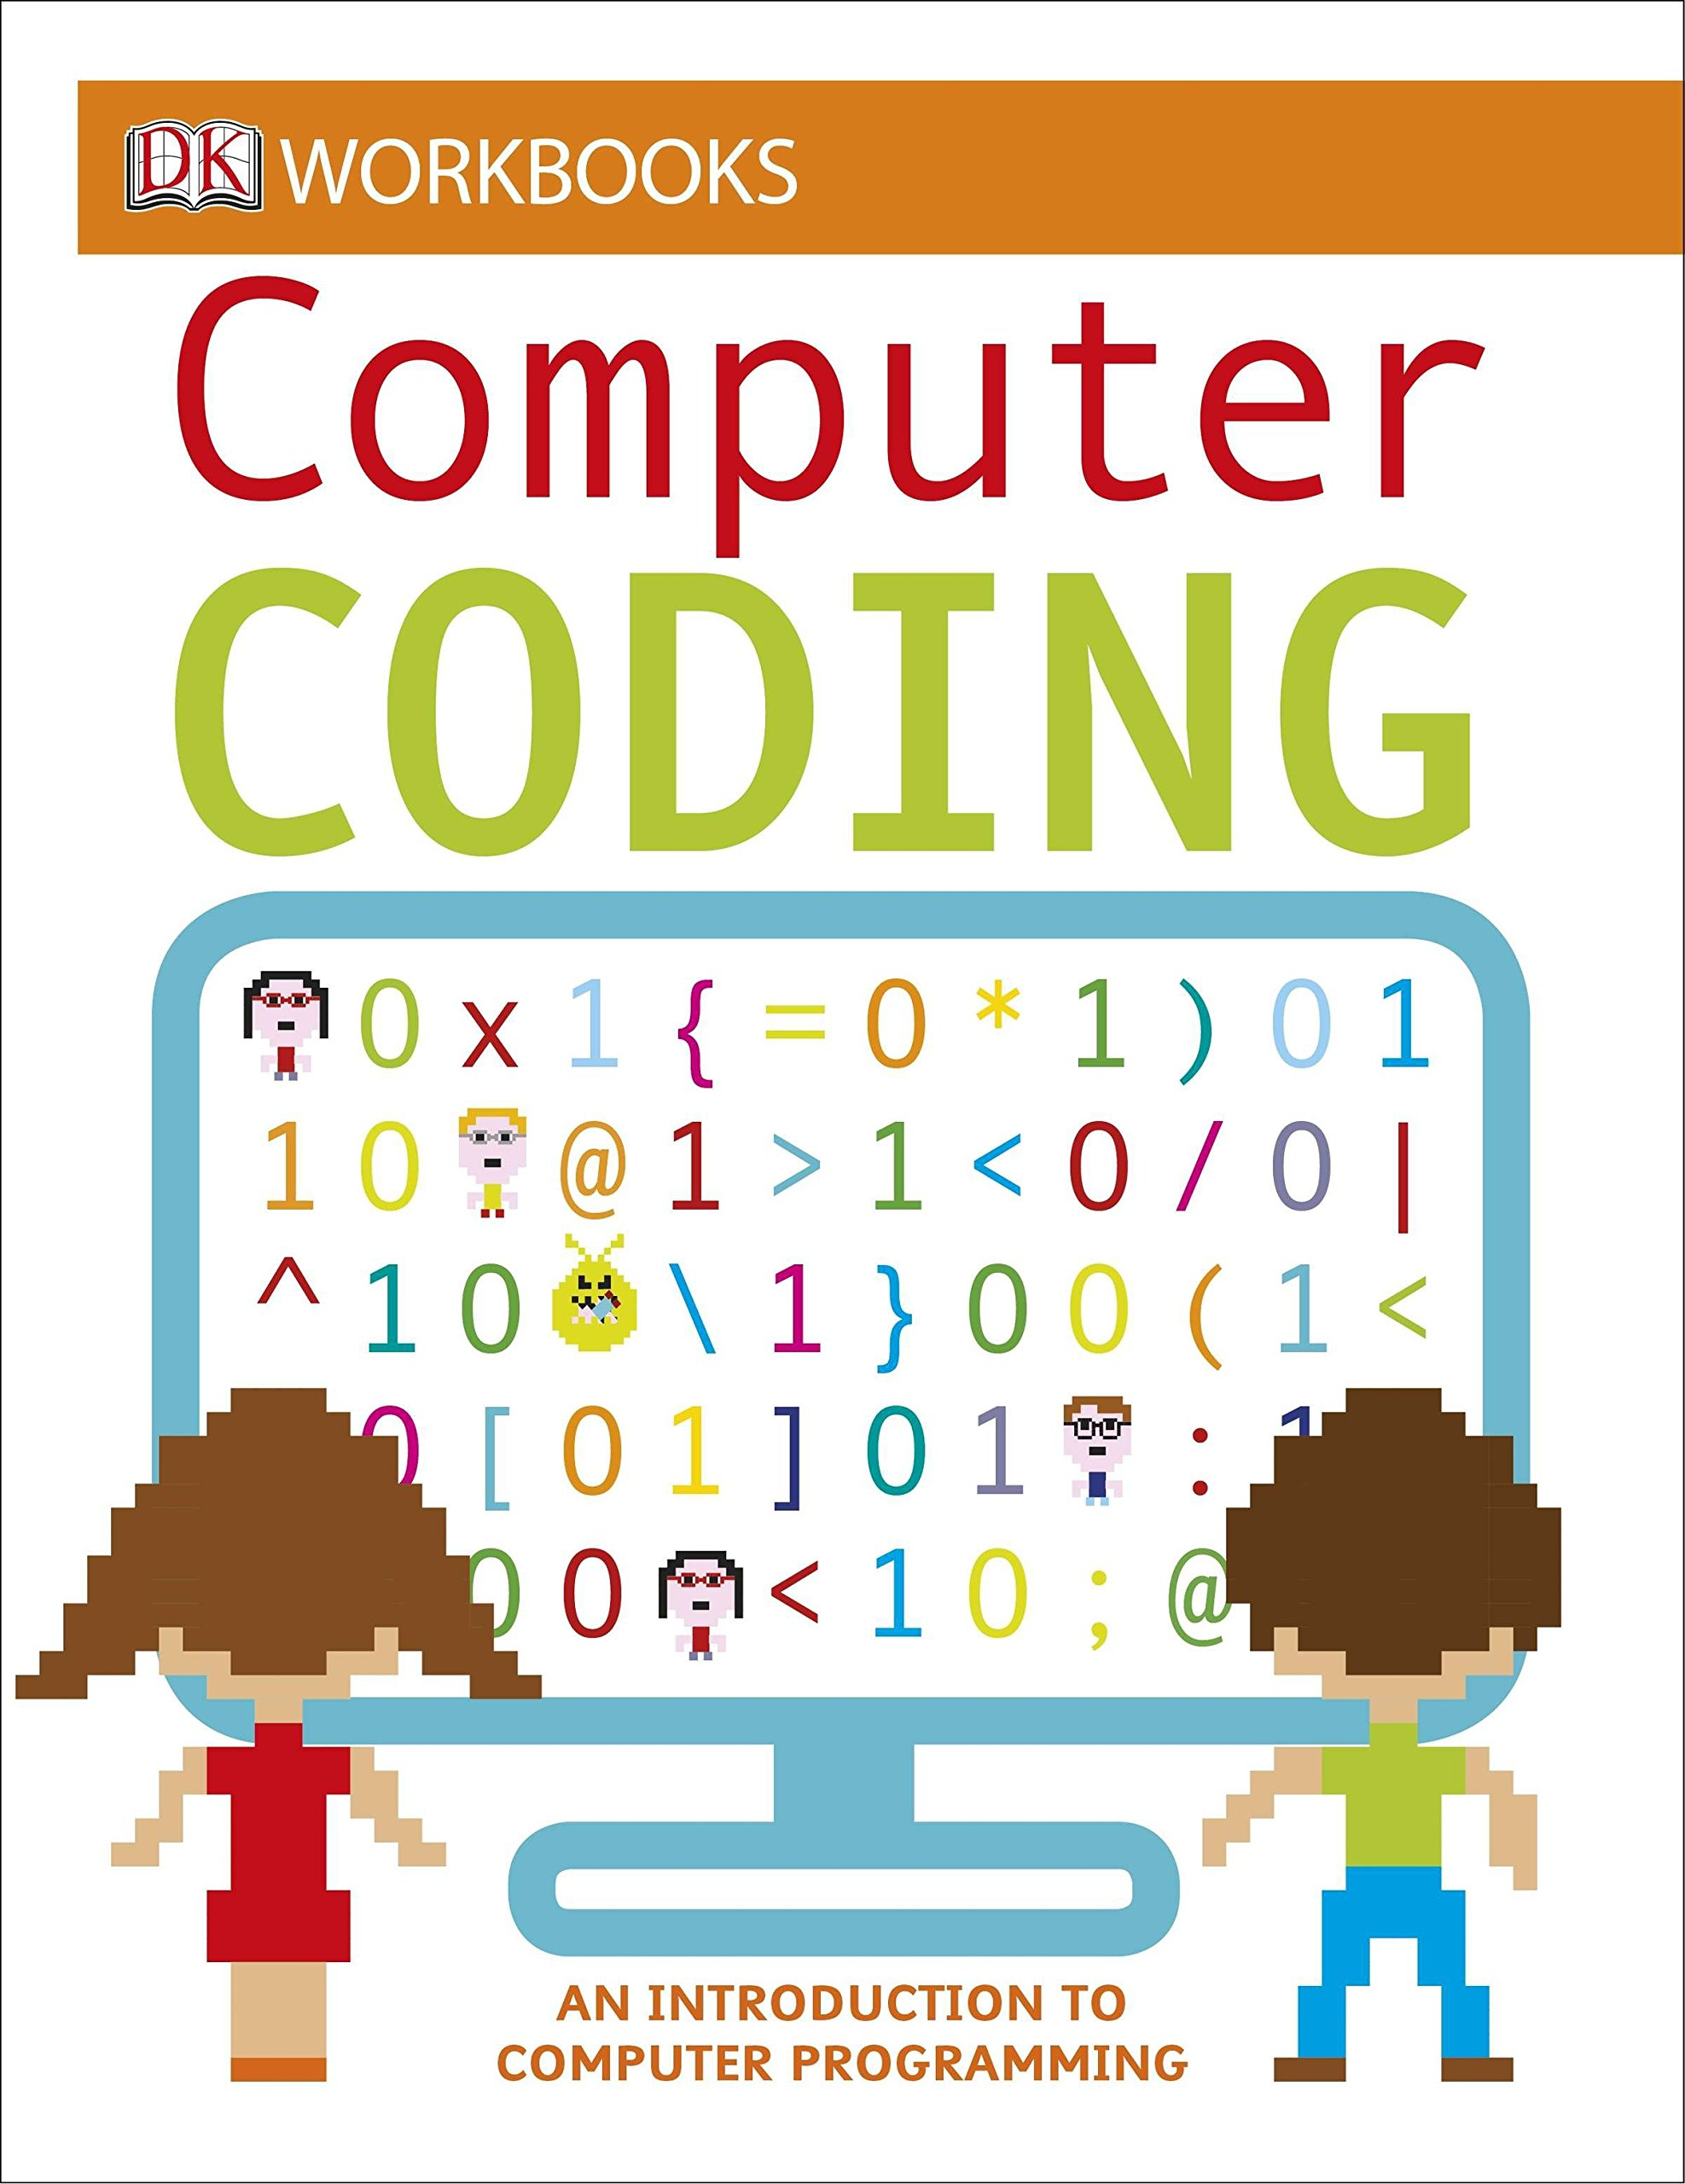 DK Workbooks Computer Coding